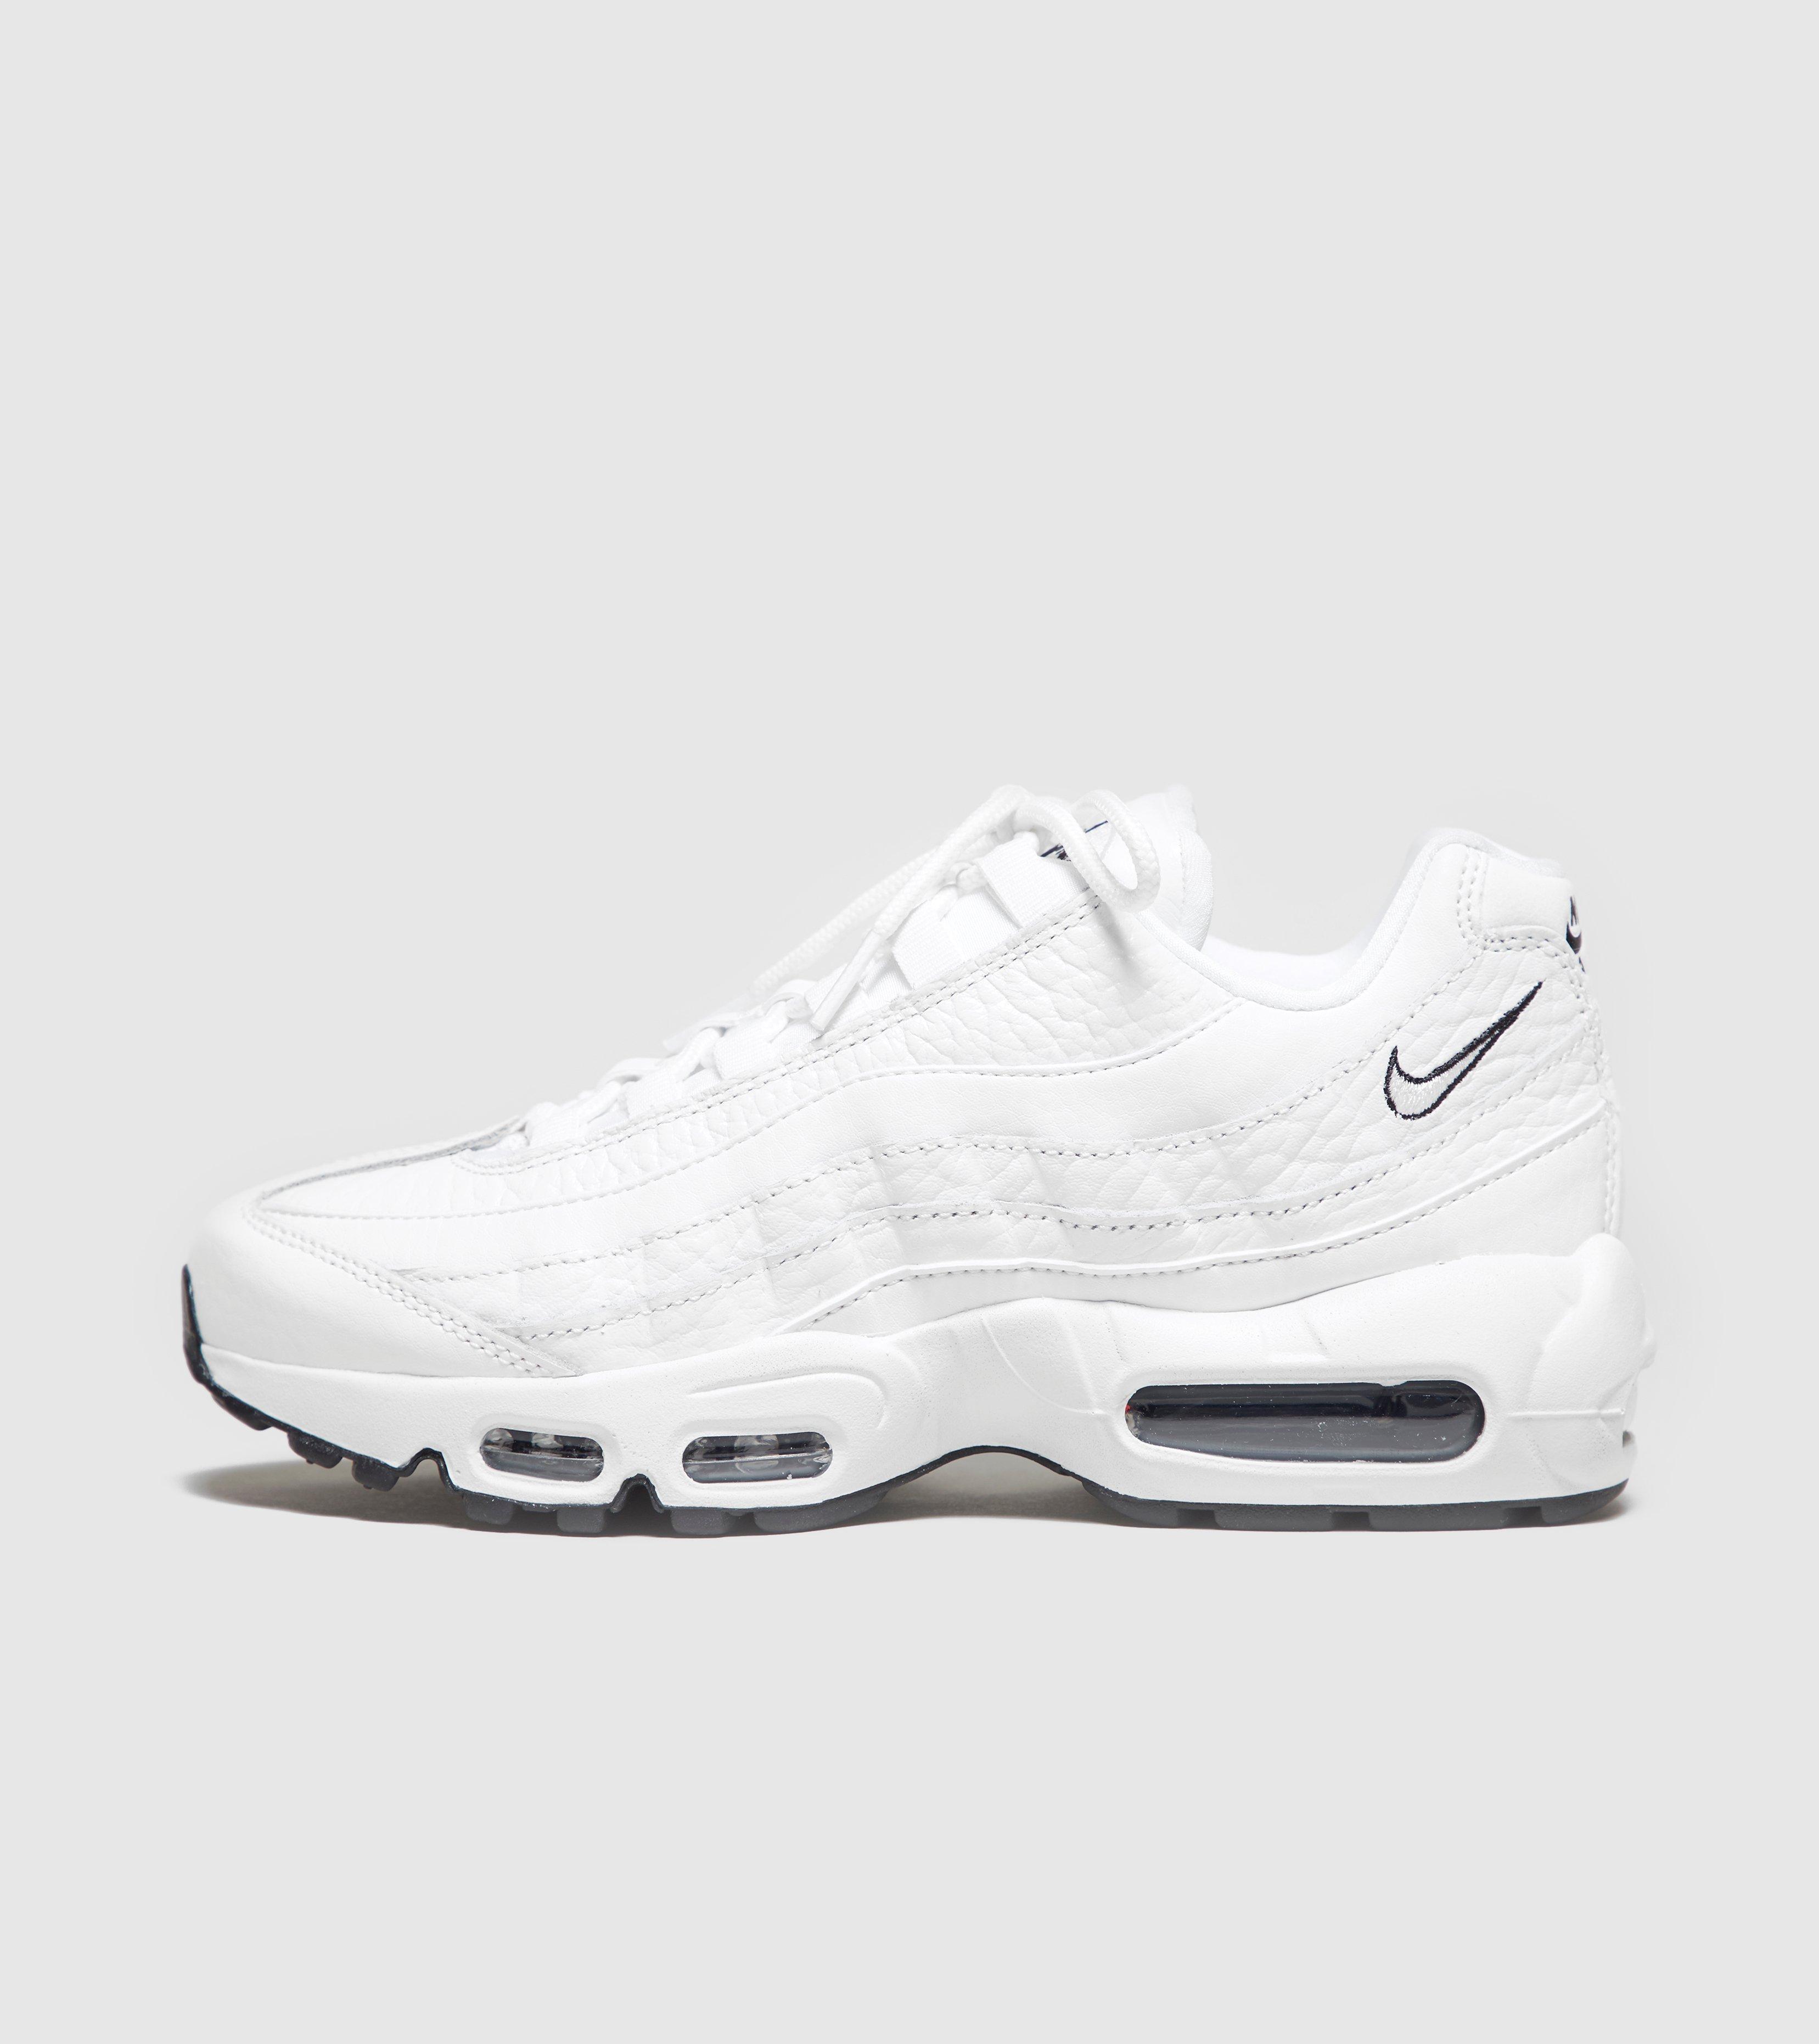 super popular 711d5 77a98 Nike Air Max 95 Women s in White - Lyst